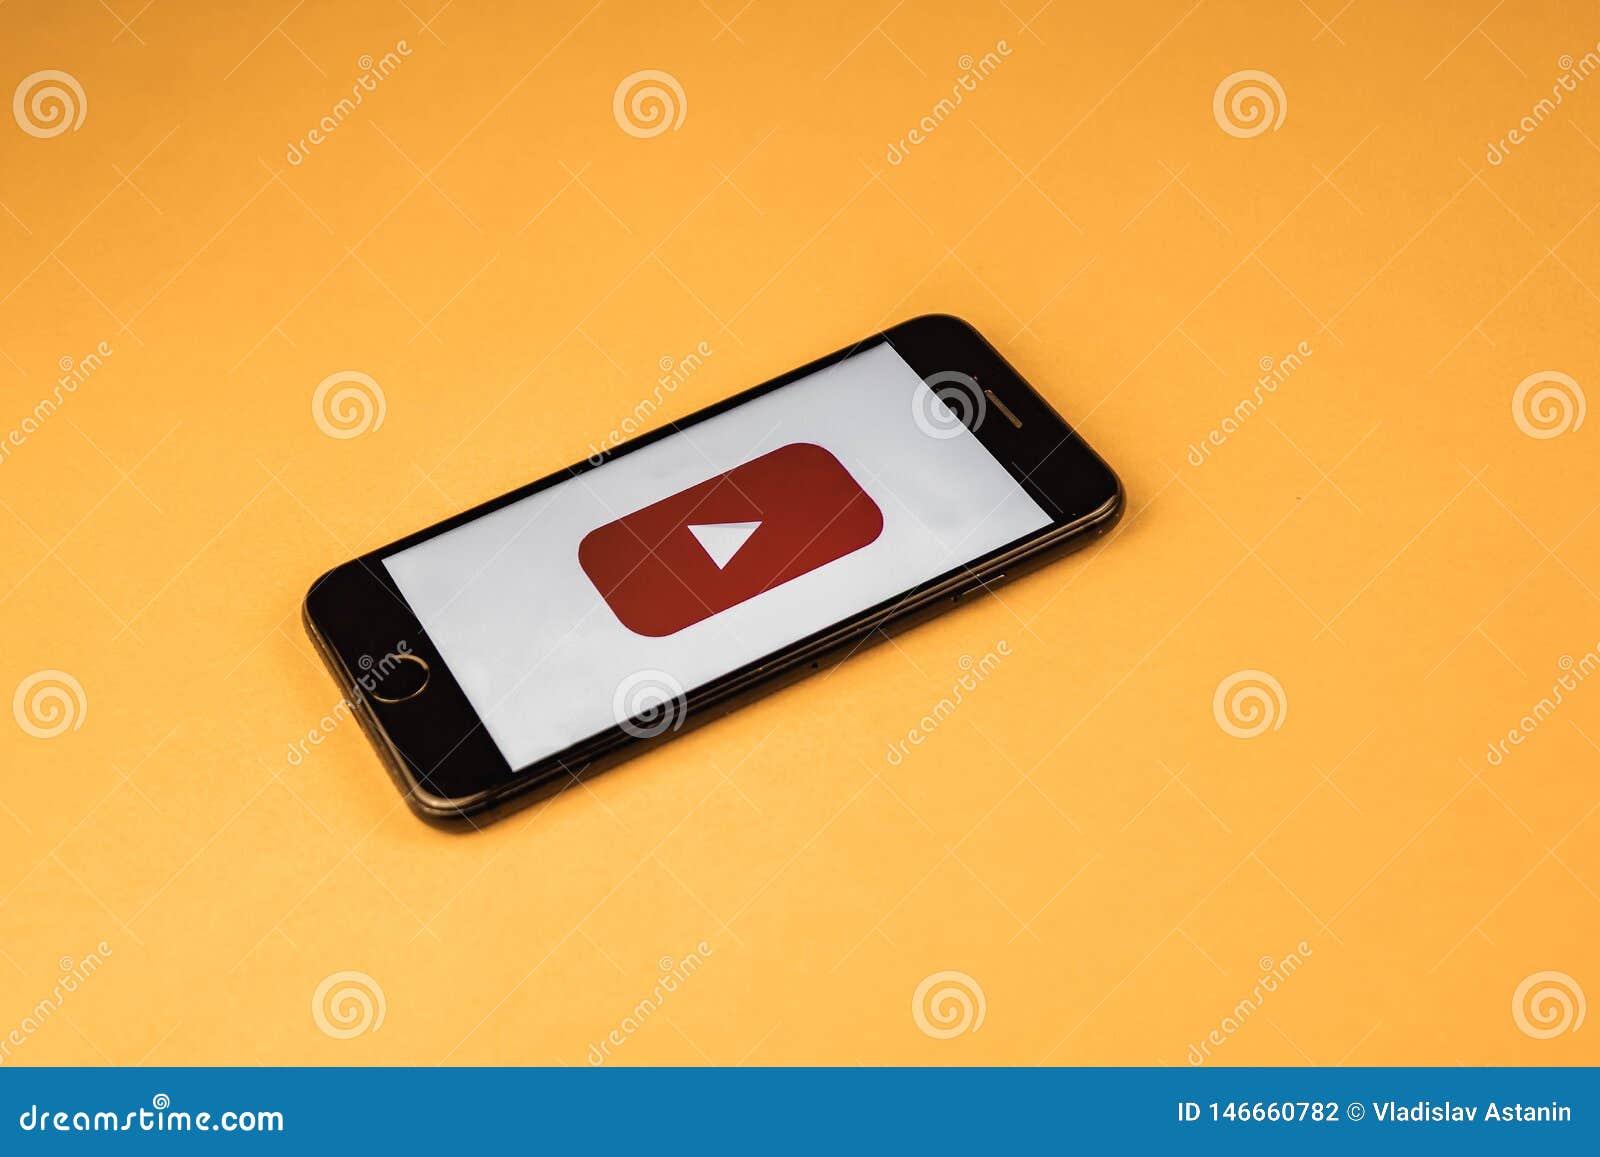 Voronezh E YouTube ? o popular